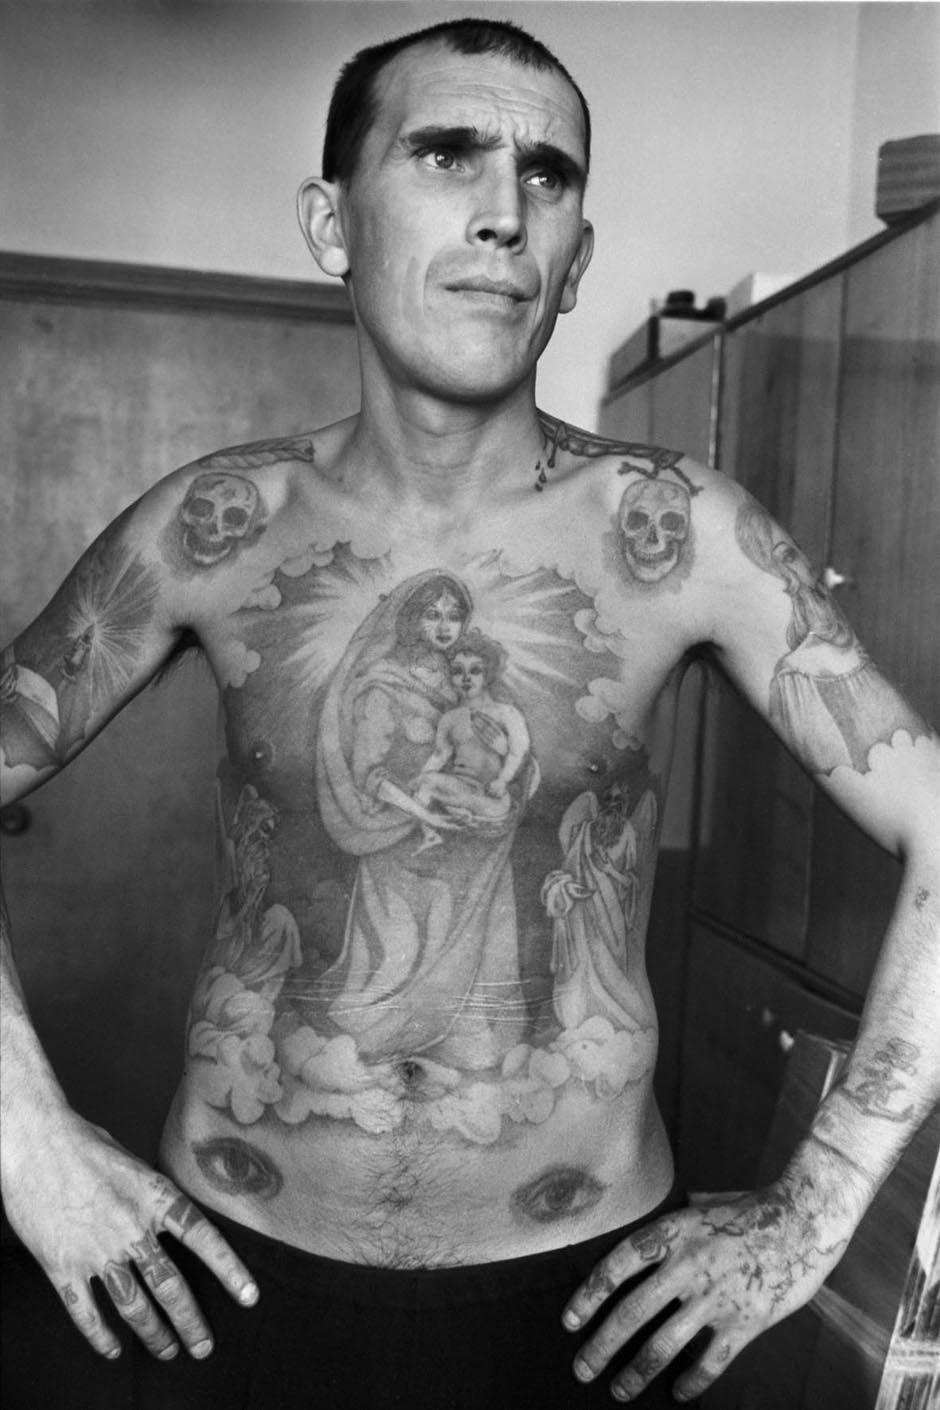 http://www.laboiteverte.fr/wp-content/uploads/2011/02/tatouage-encyclopedie-criminel-russe-prison-03.jpg